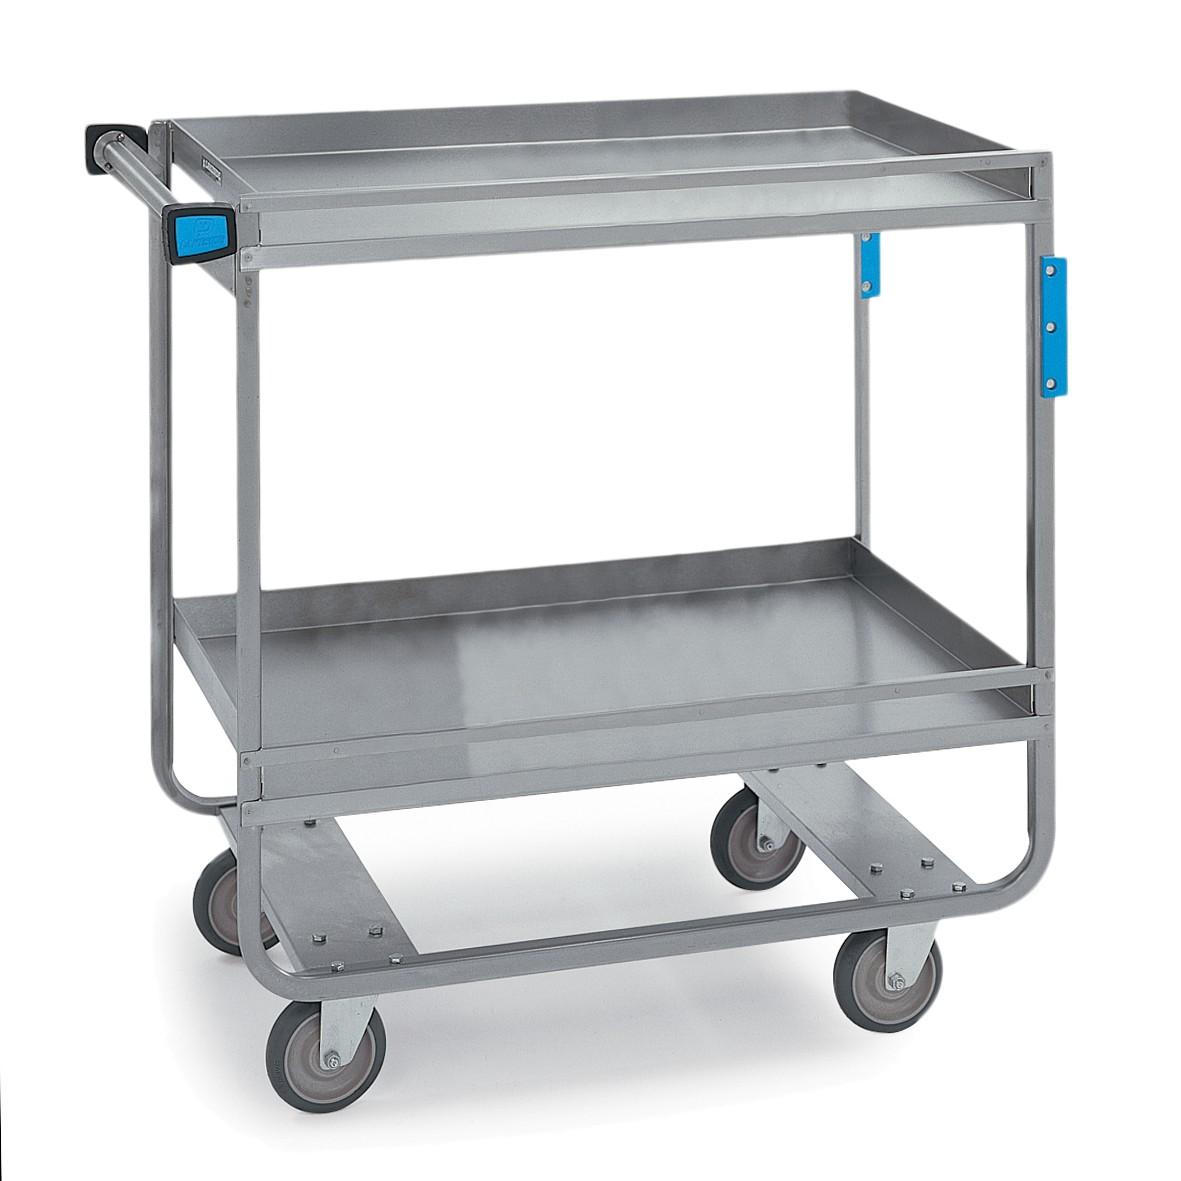 Guard Rail Utility Cart - 700 lbs Capacity - 19-3/8W x 34-1/2H x 32-5/8L